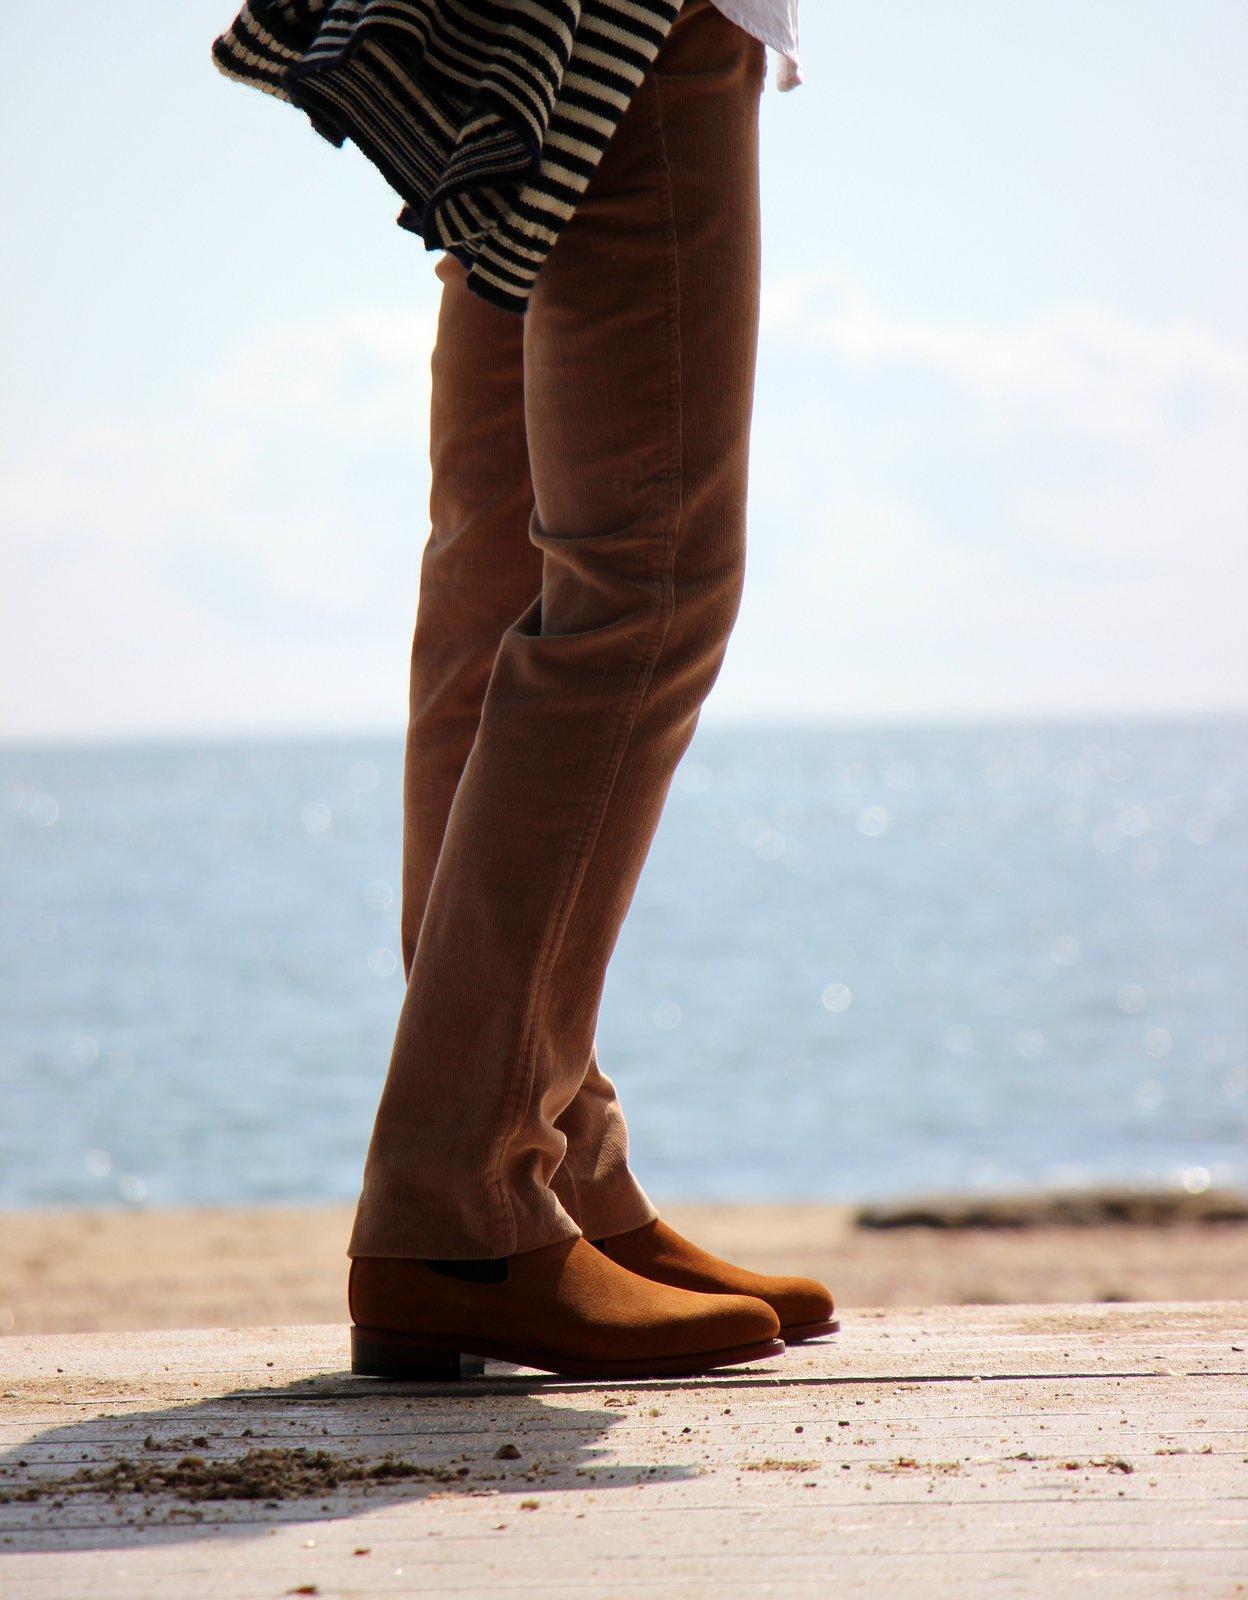 ec19482972d Salt Water New England: Dukes Boots + Cordings - For Ladies